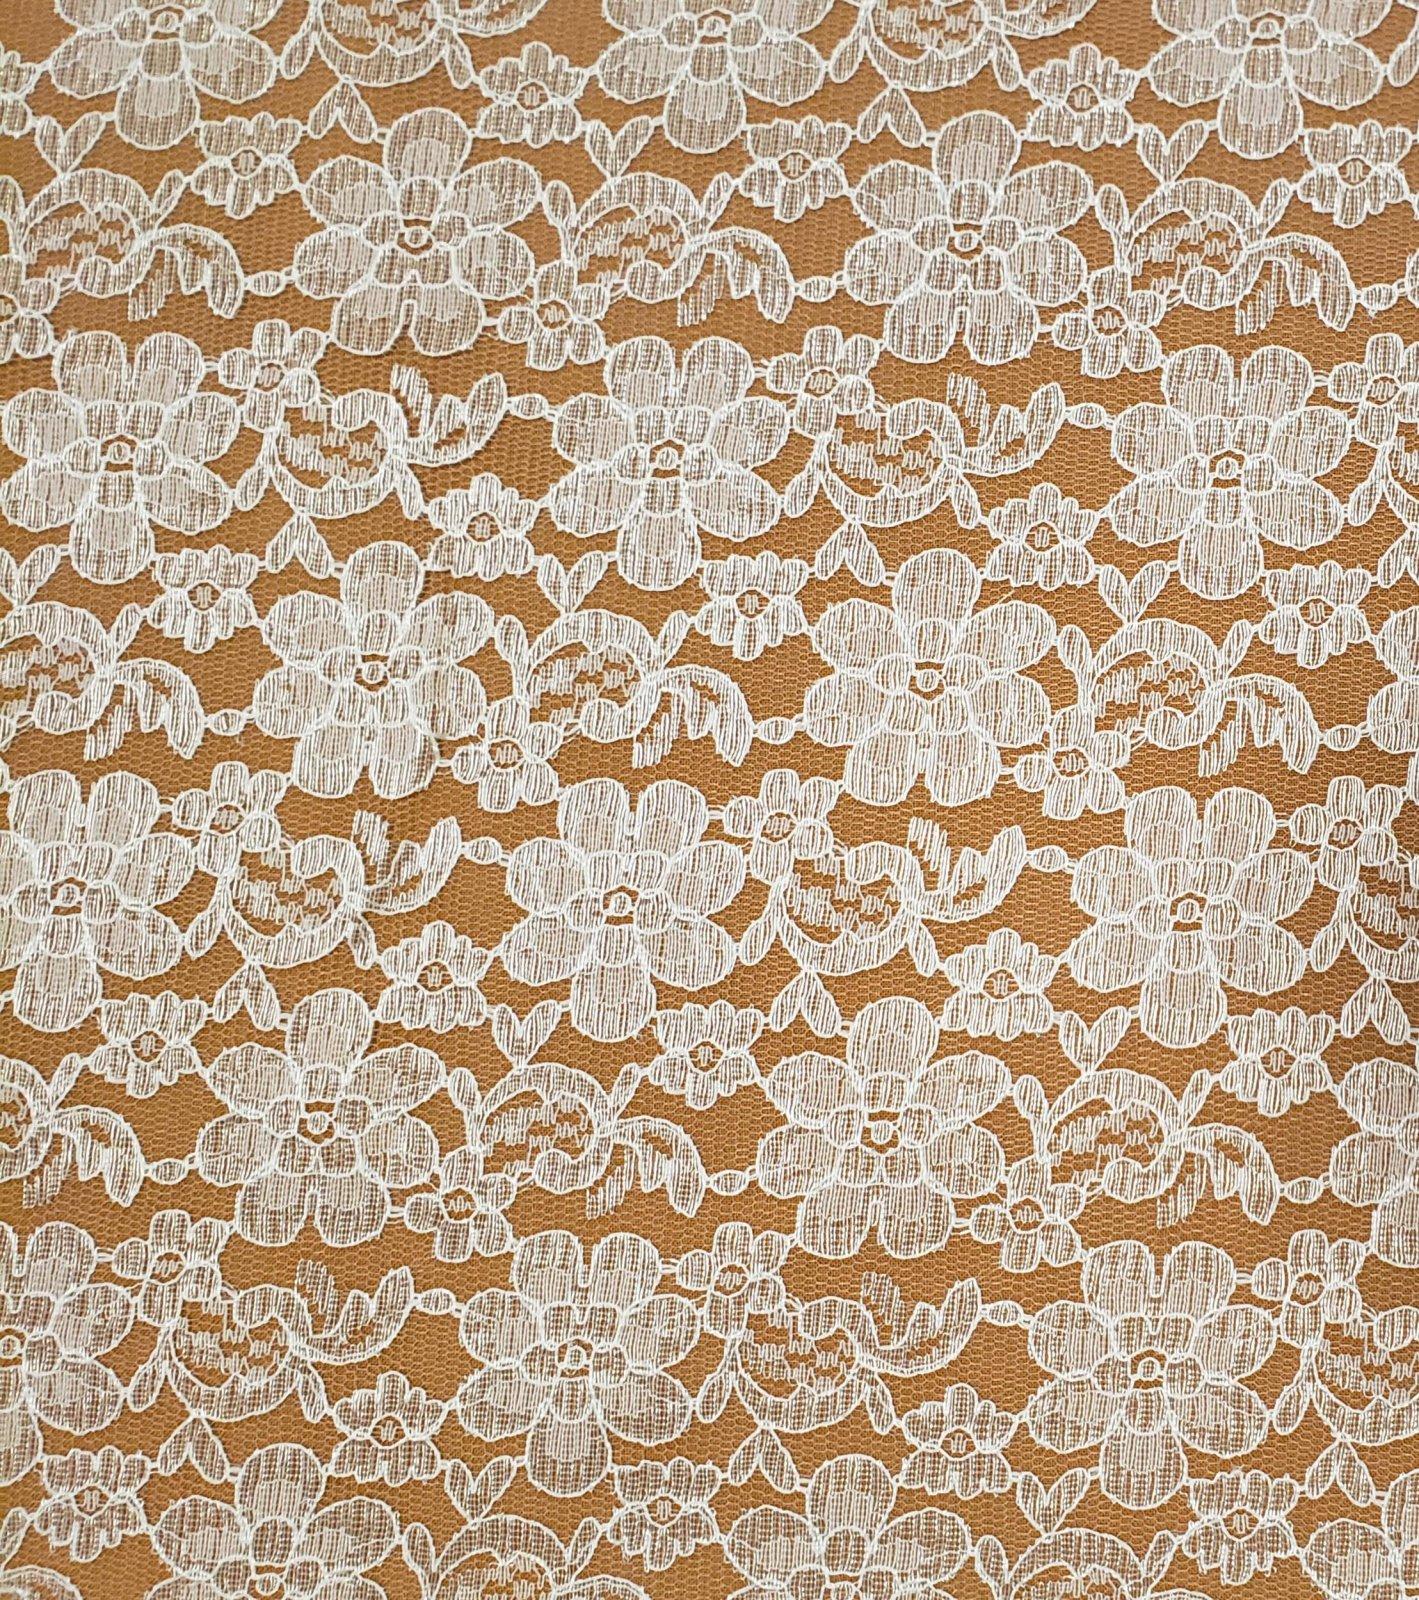 Raschel Allover Lace 60in - Cream